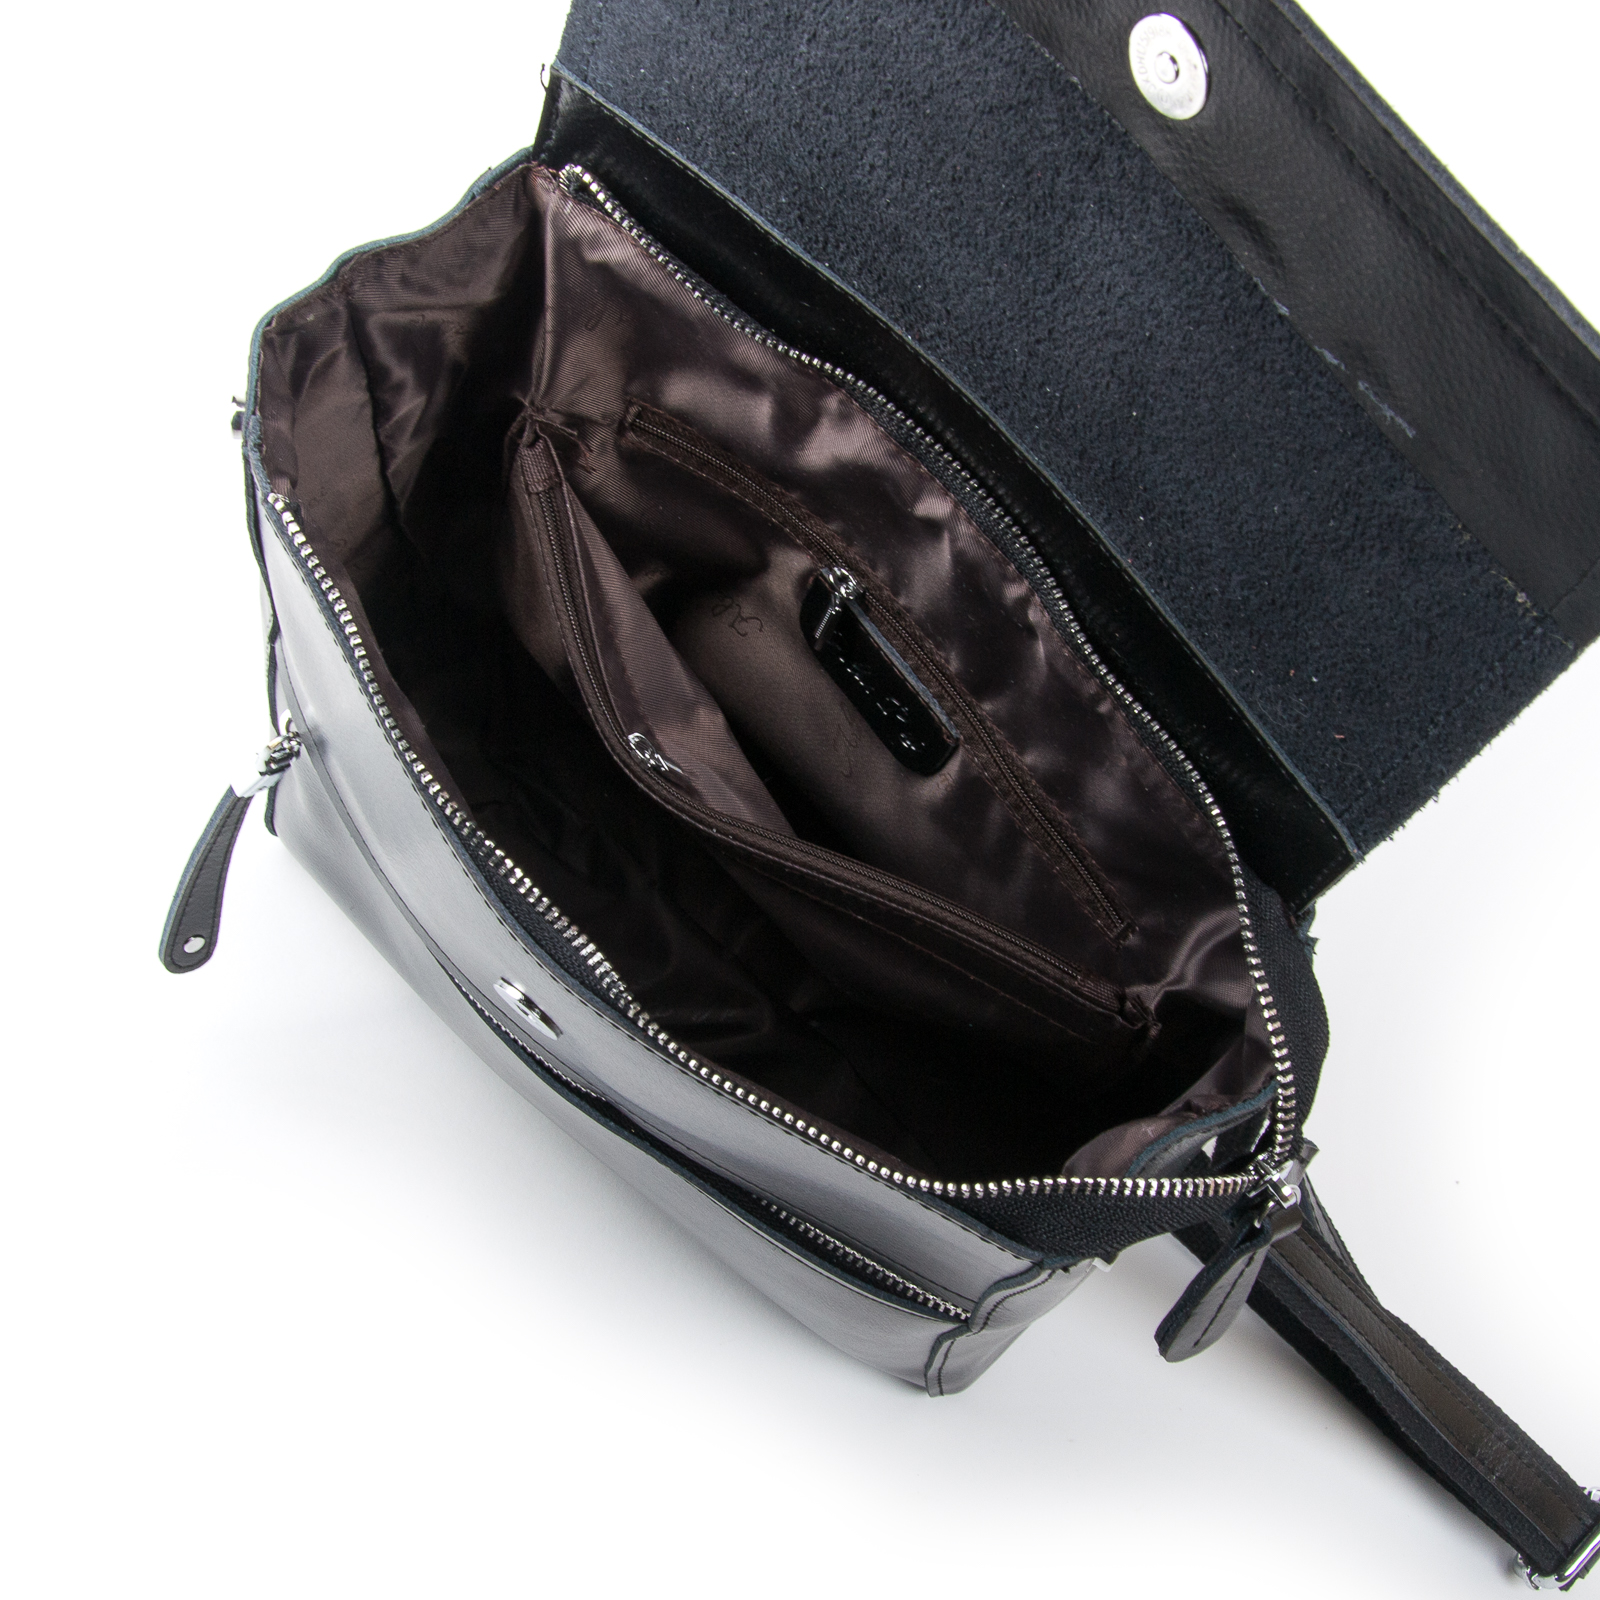 Сумка Женская Рюкзак кожа ALEX RAI 03-01 1005 black - фото 5